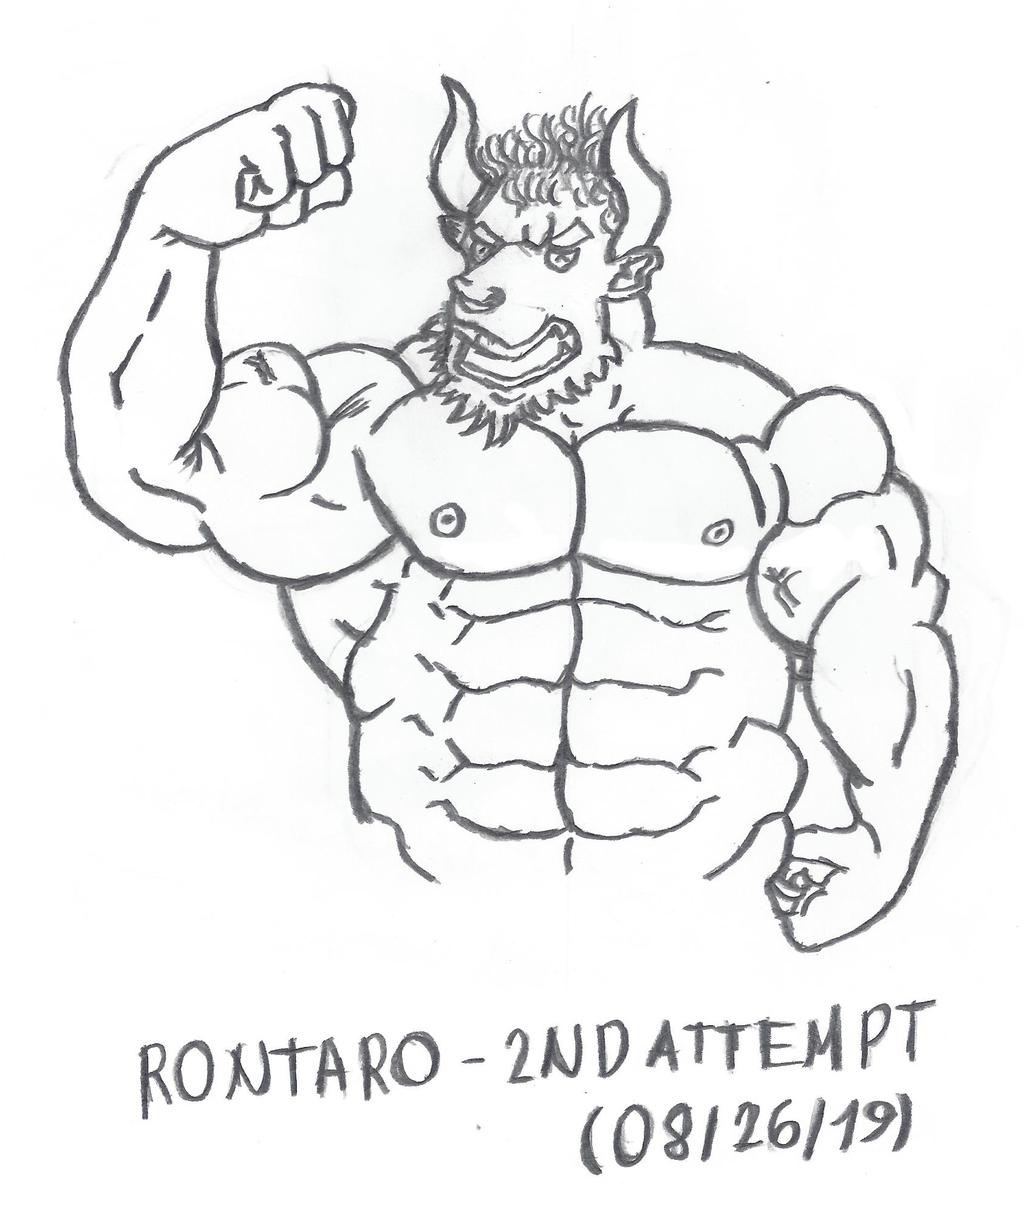 Rontaro Bultor Magno - 2ND Attempt